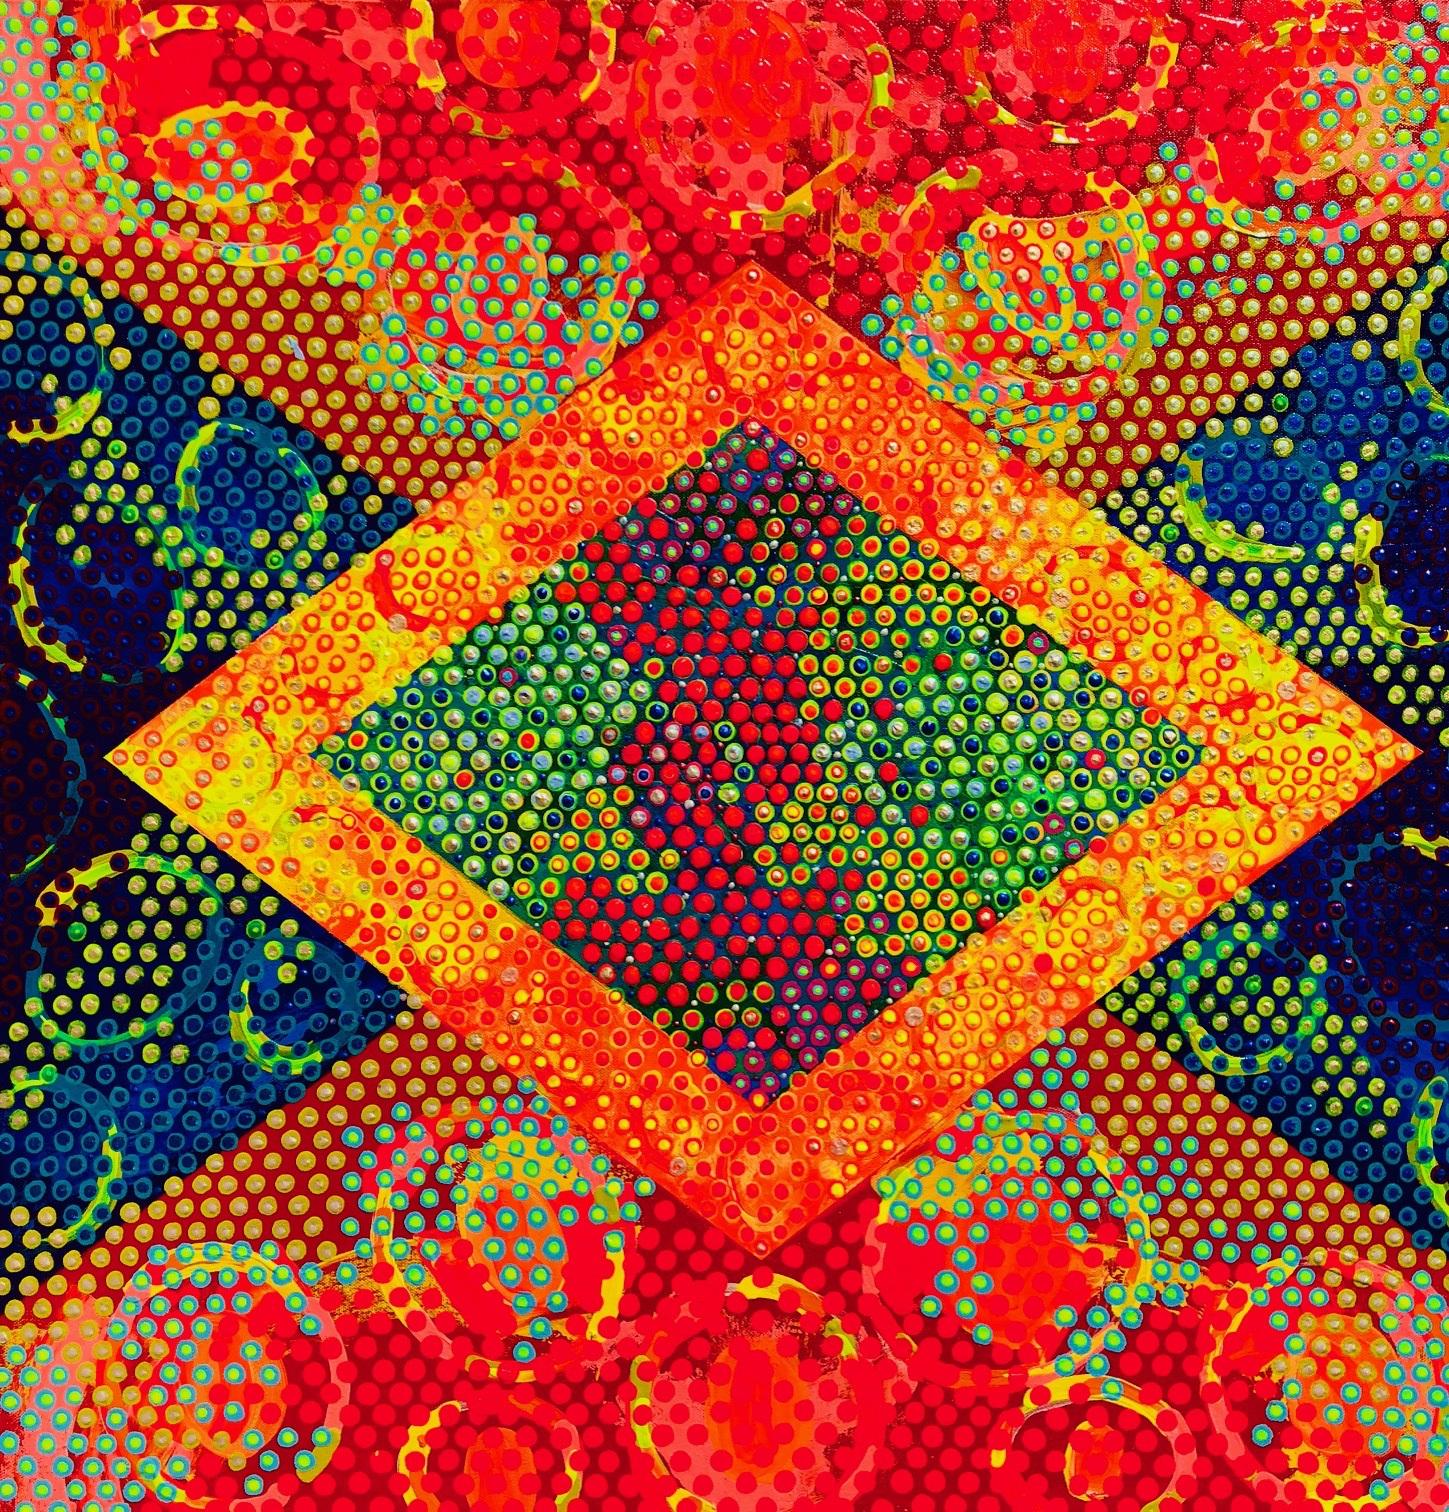 "Equipoise Summer 7, acrylic on canvas, 30"" x 30"""